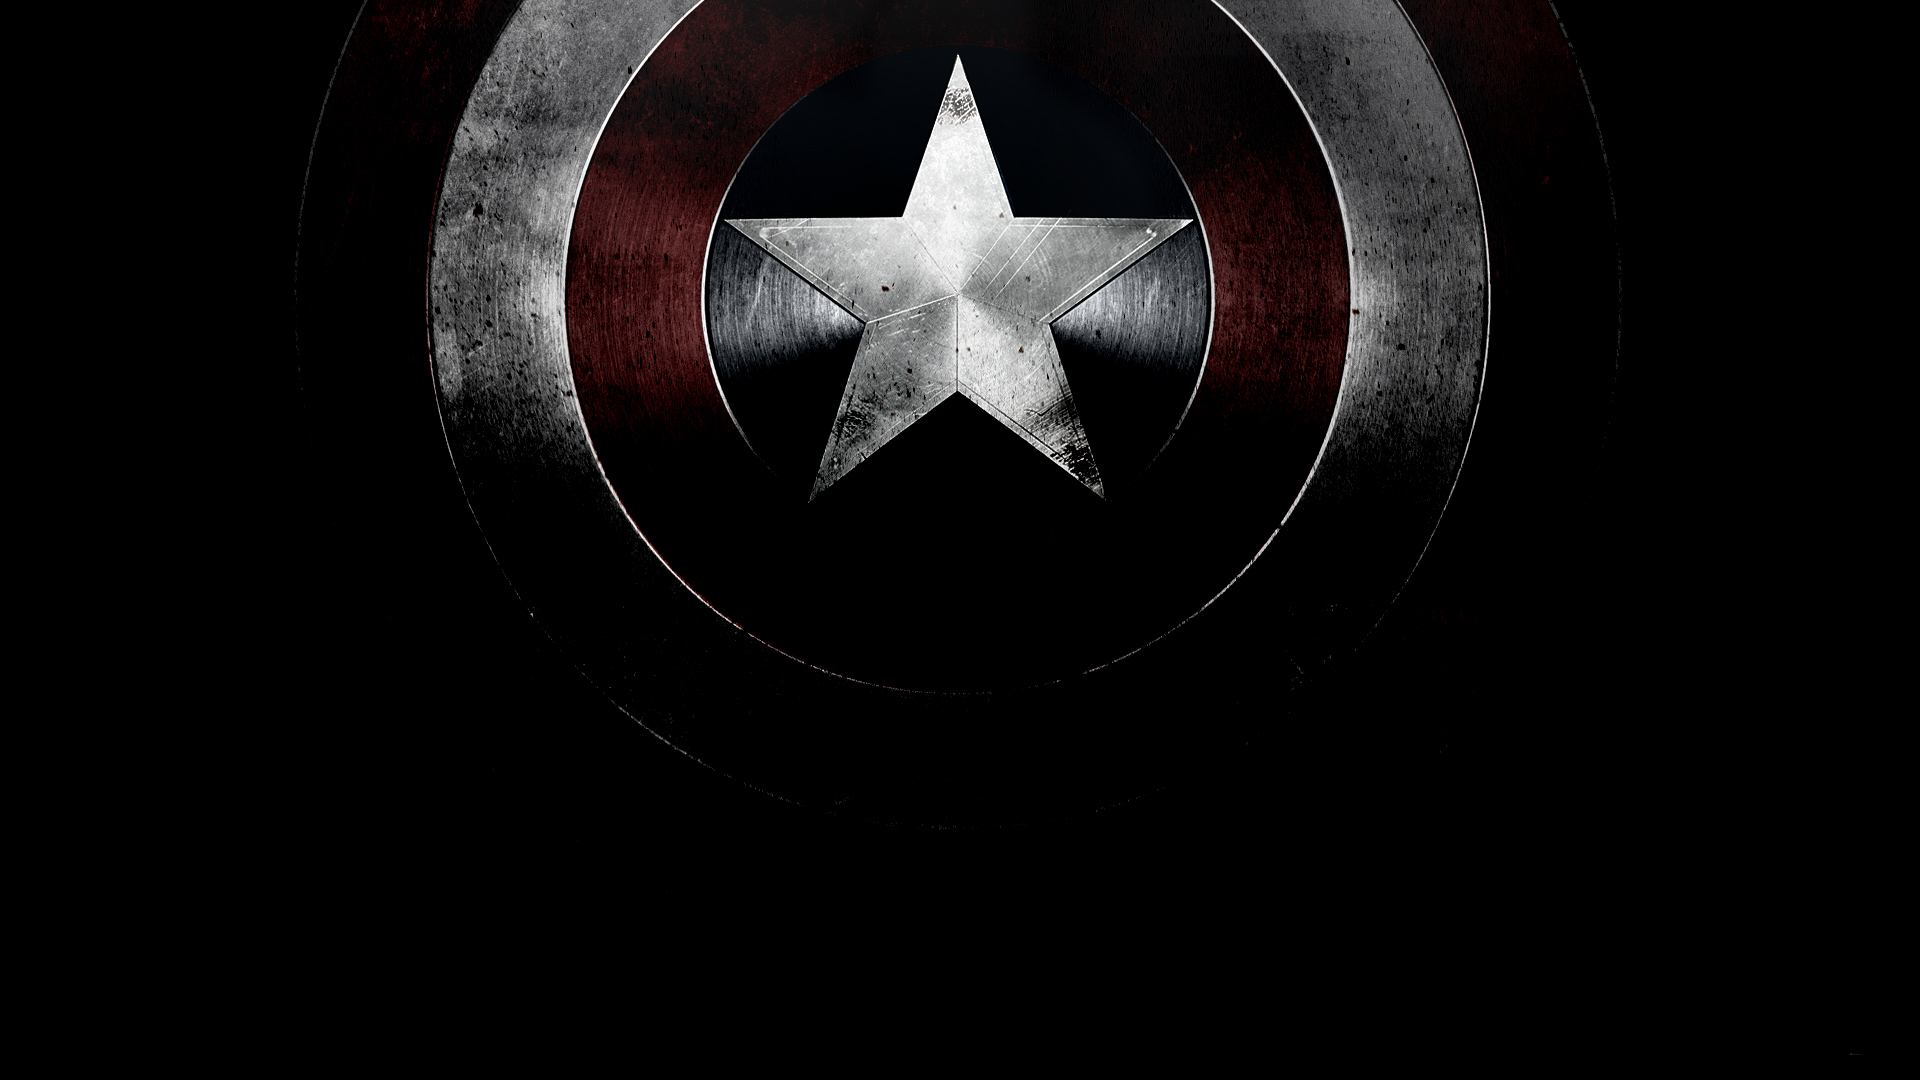 Captain America Wallpaper 1920x1080 Captain America Shield Marvel 1920x1080